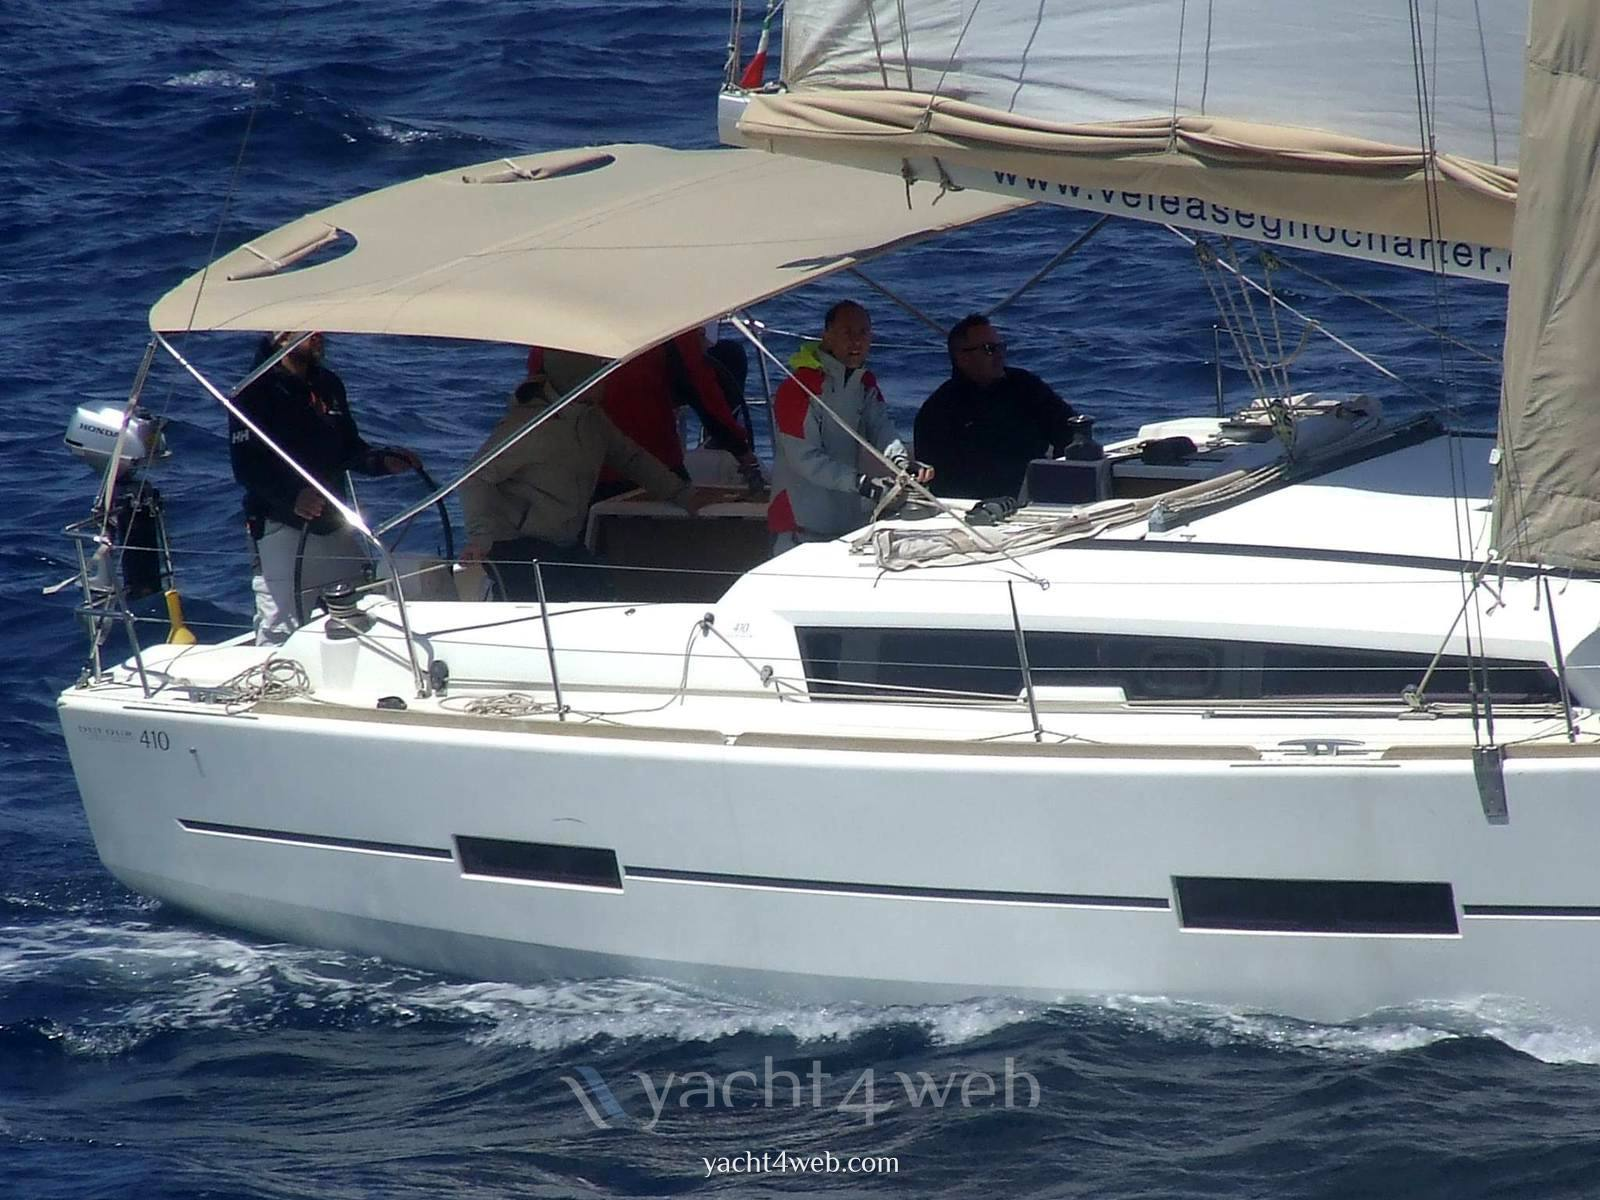 Dufour Yachts 410 grandlarge Barca a vela usata in vendita